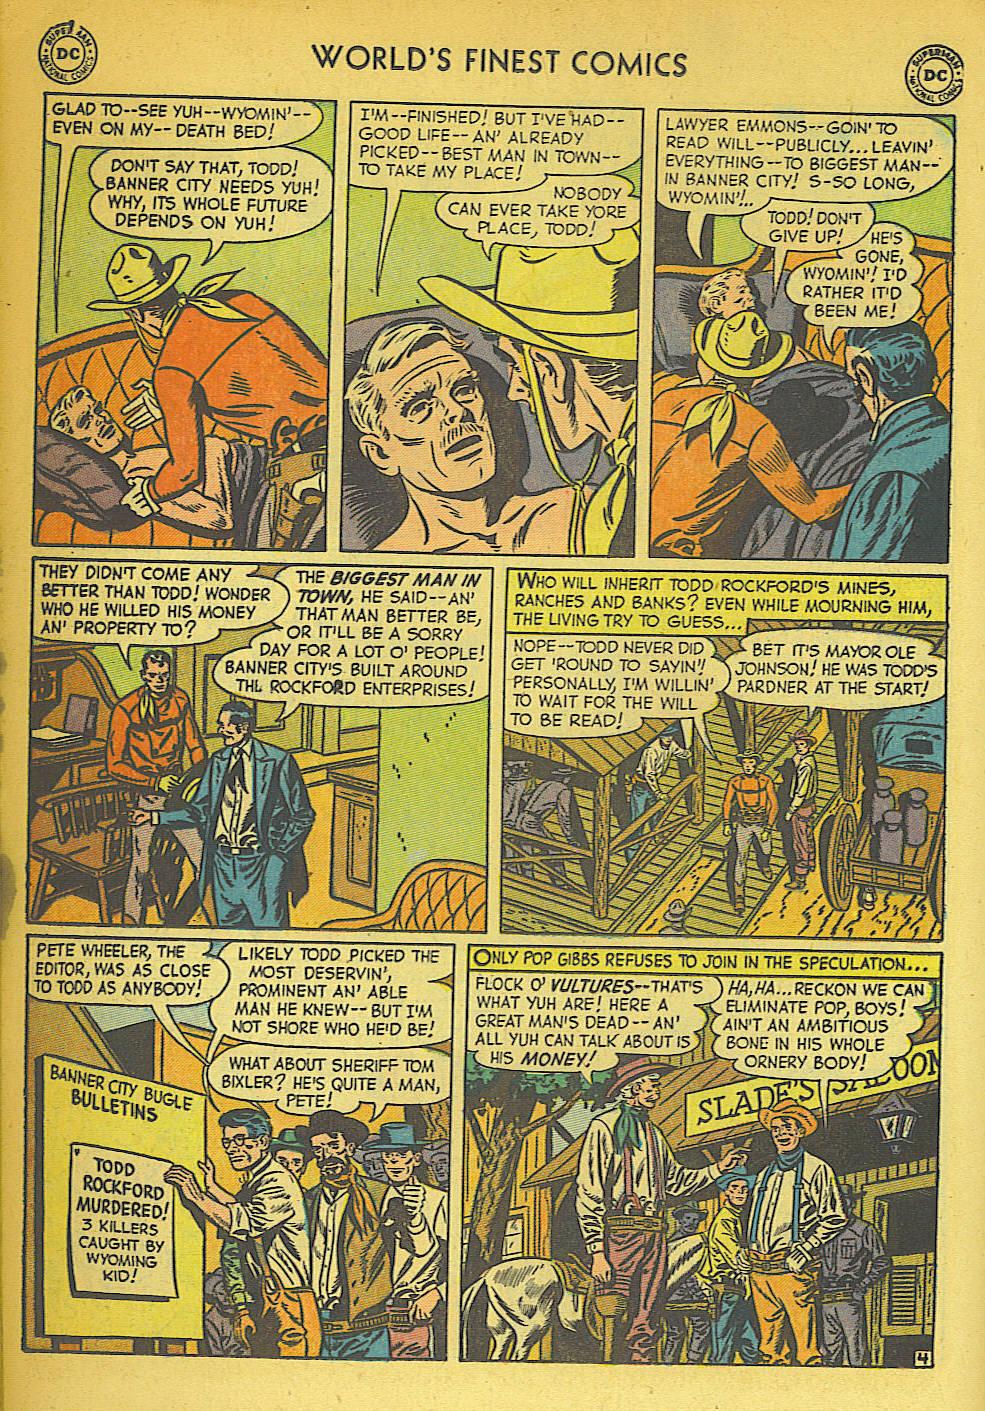 Read online World's Finest Comics comic -  Issue #57 - 32